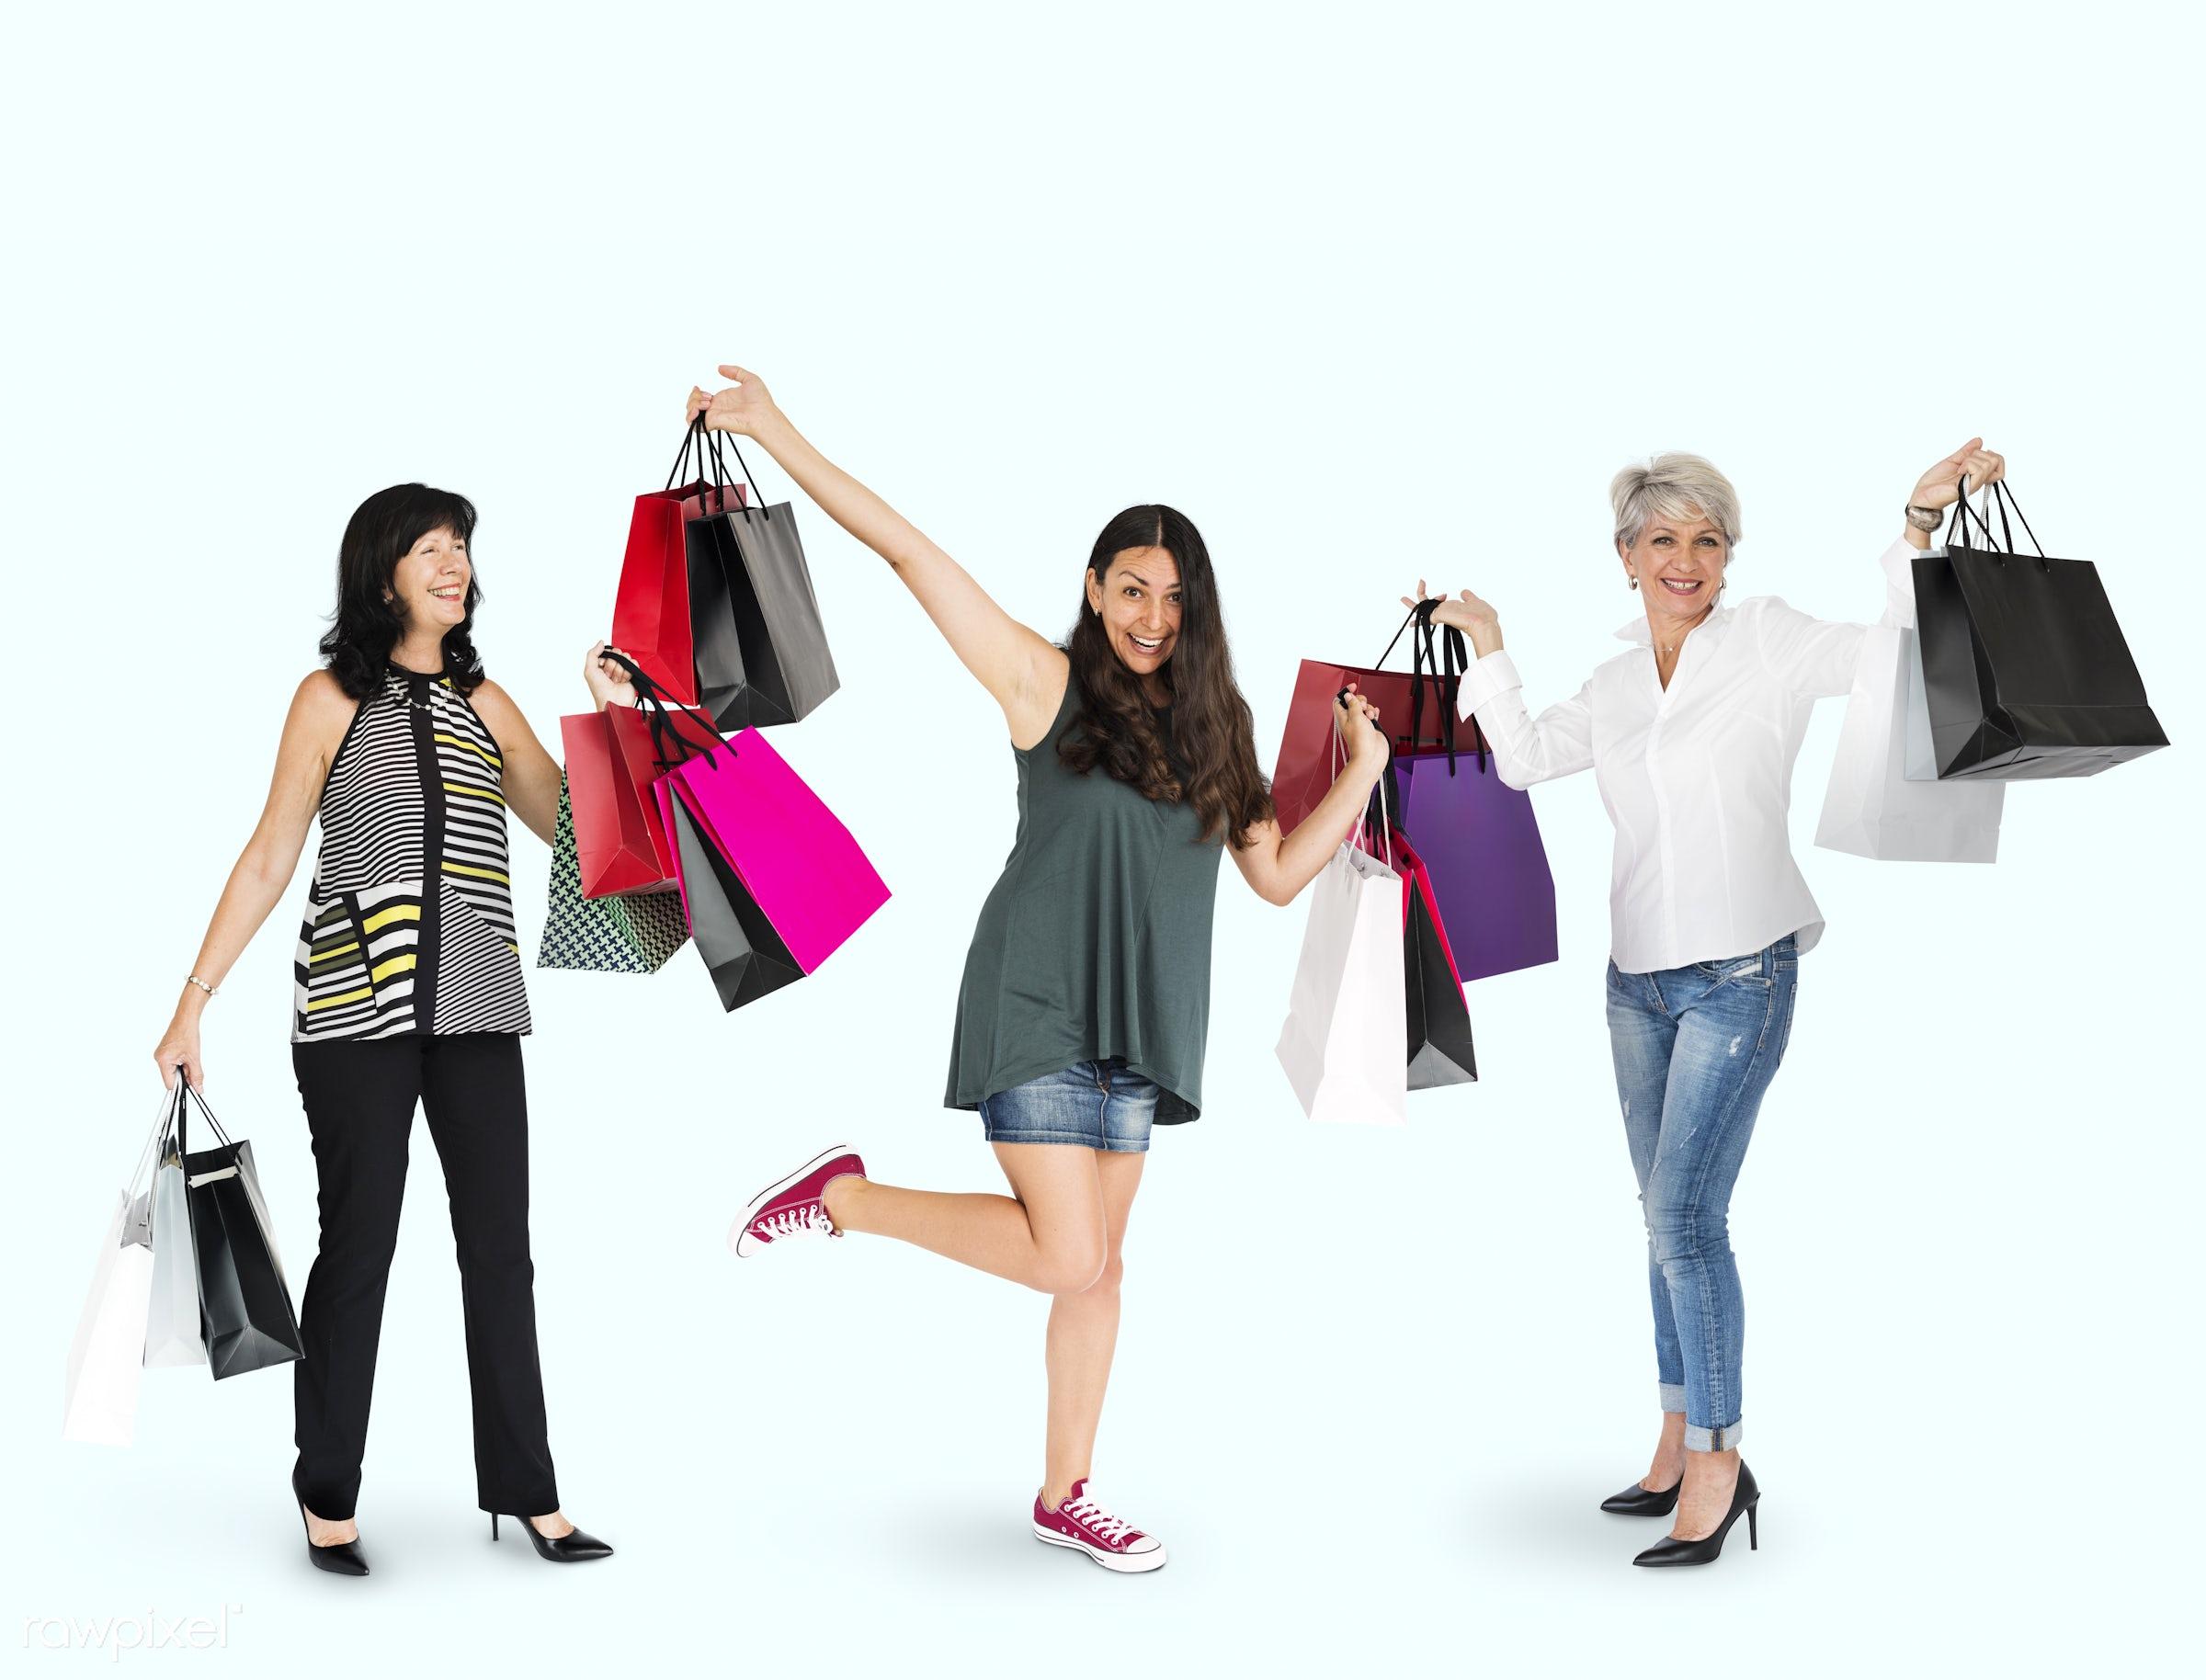 studio, expression, shop, person, buy, people, caucasian, woman, lifestyle, studio squareset, smile, cheerful, smiling,...